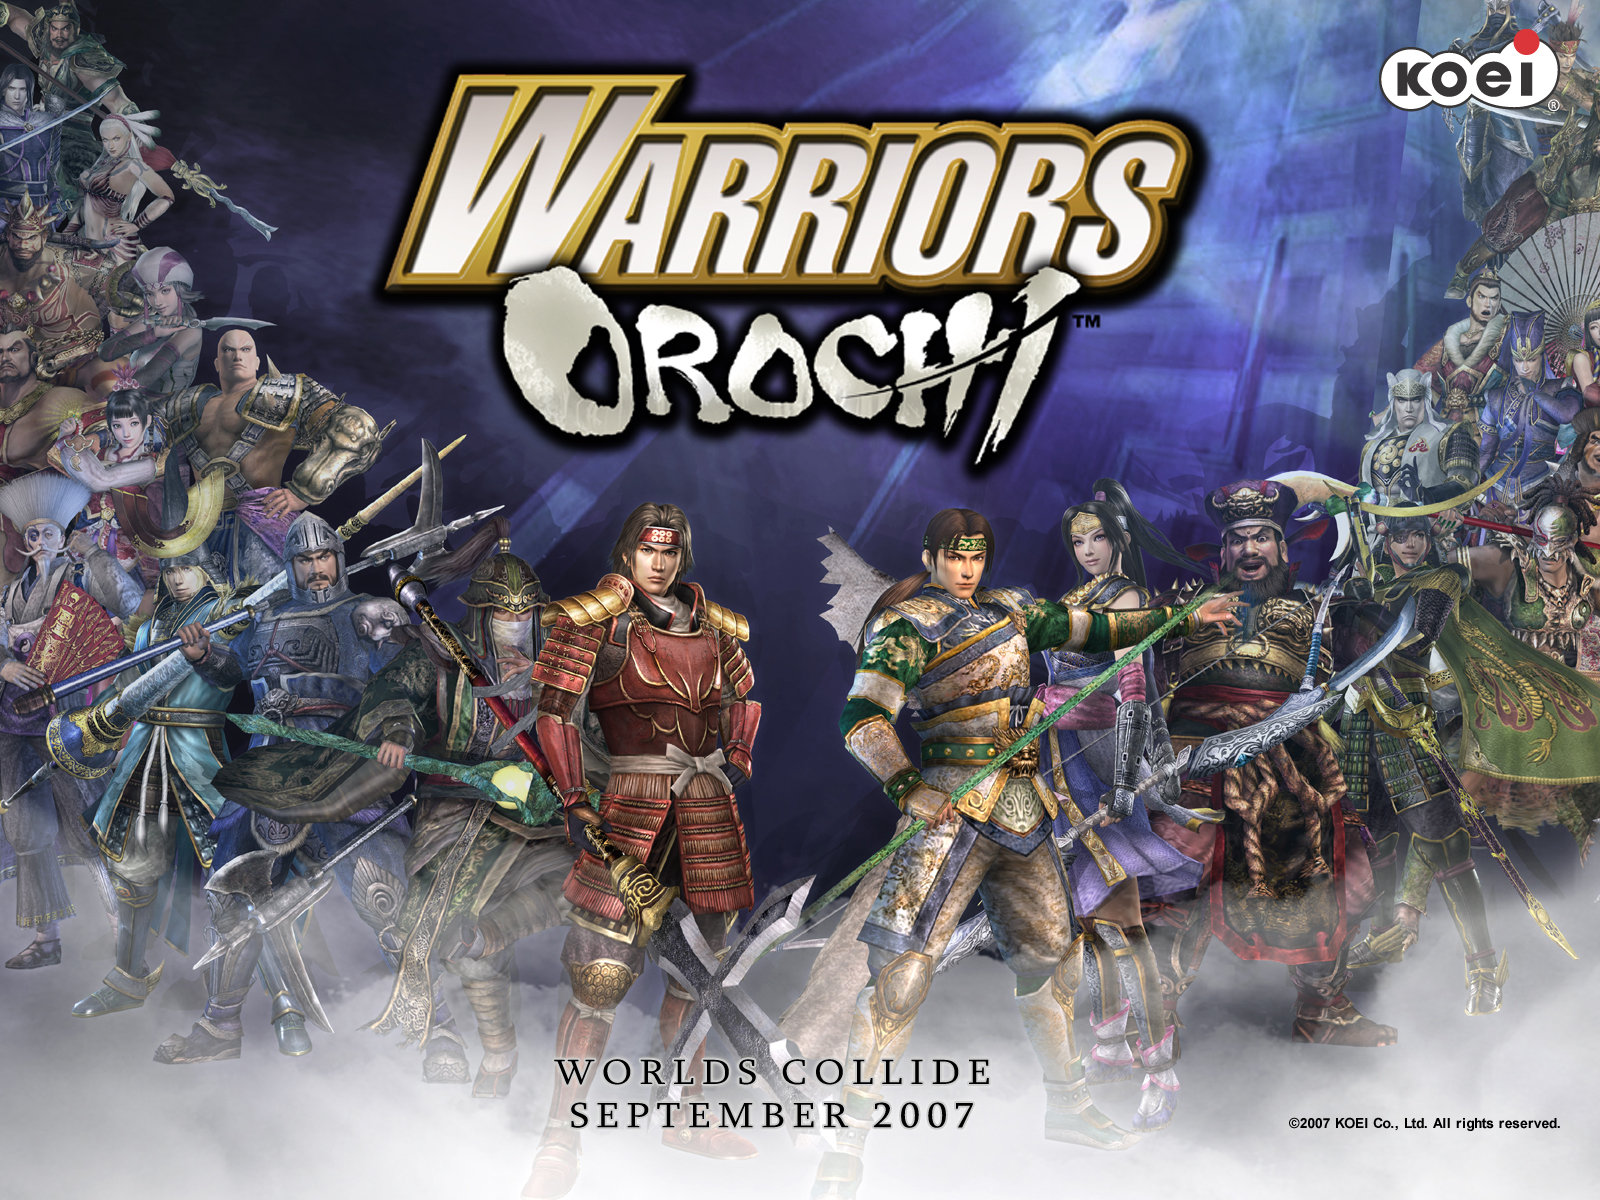 samurai warriors 2 4th weapon guide